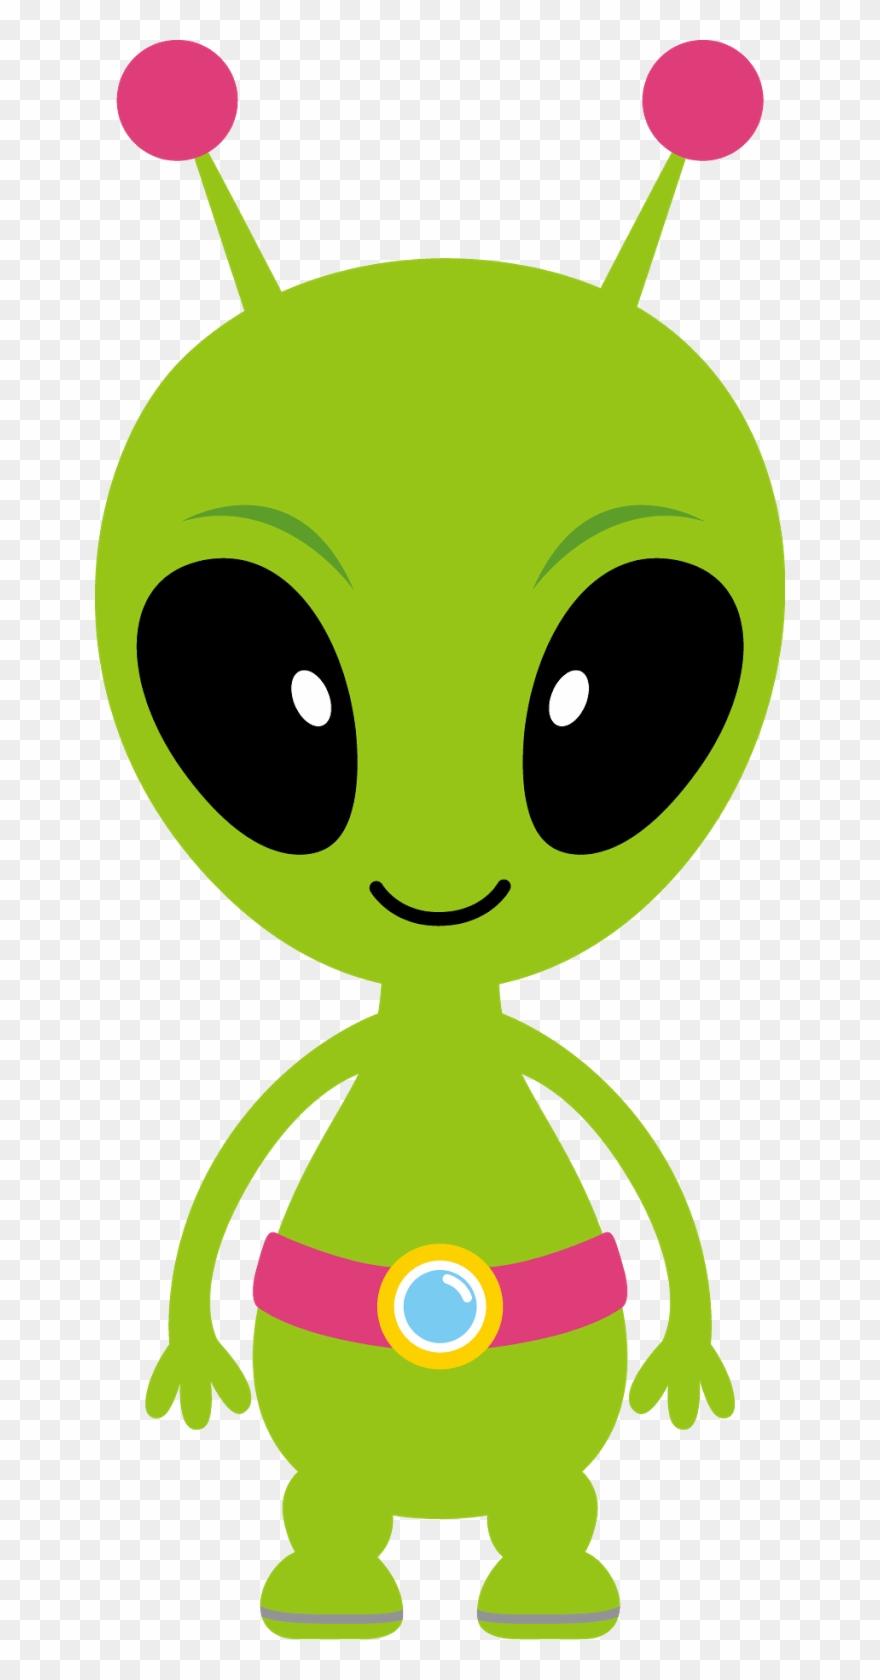 Background Clipart Alien.